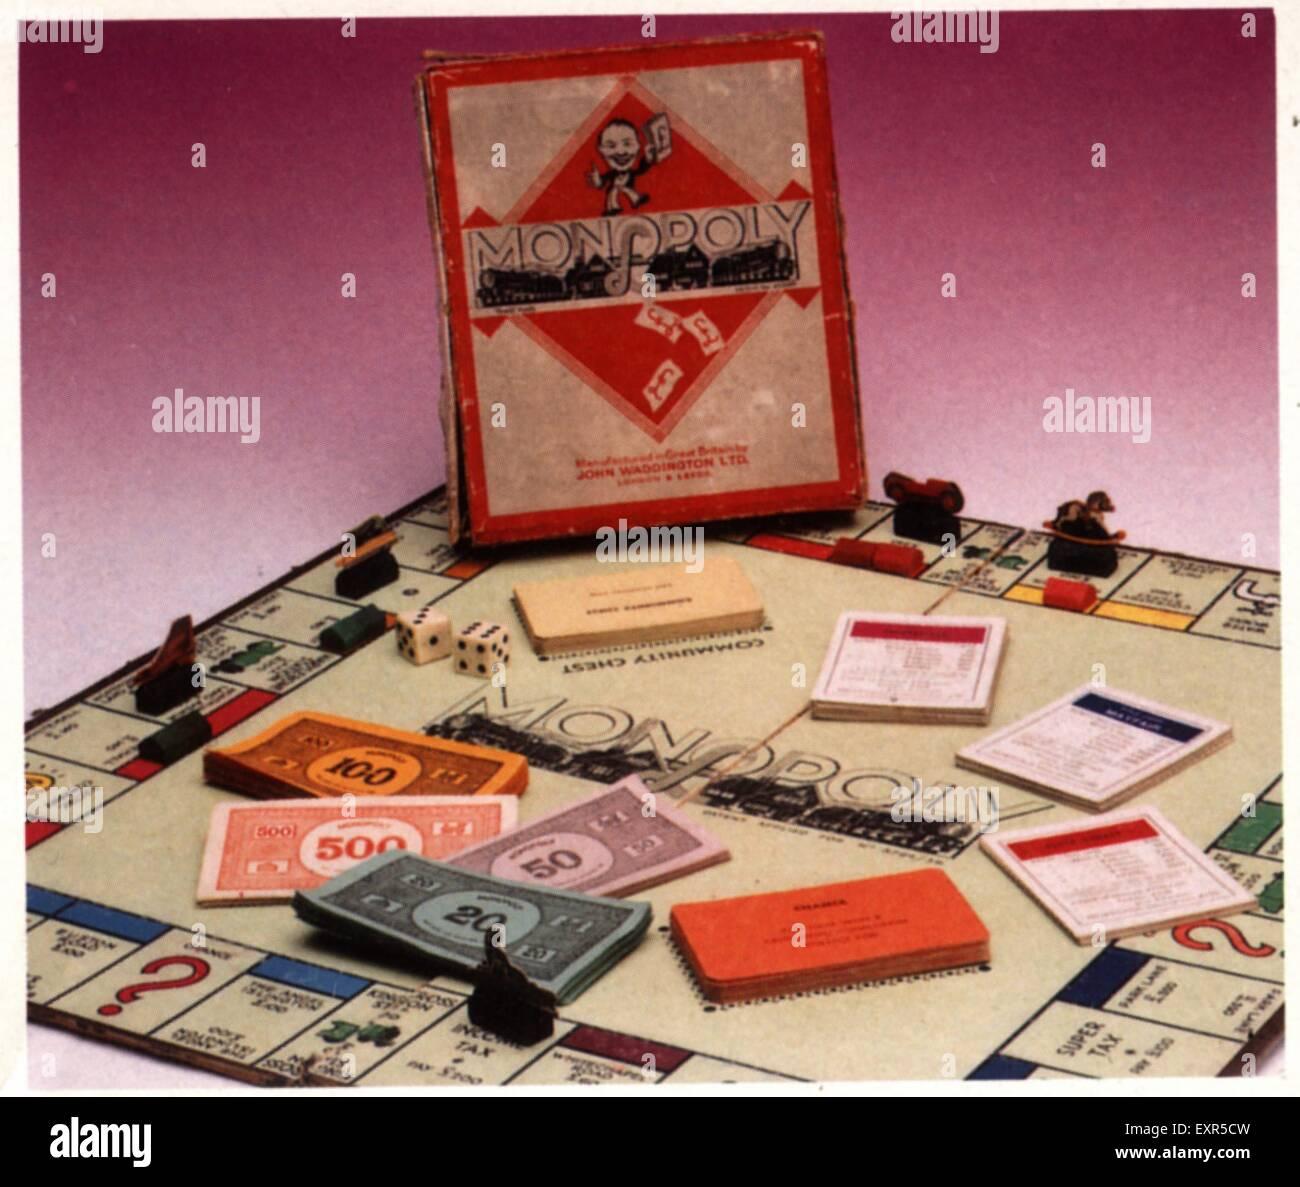 1970s UK Monopoly Promotional - Stock Image